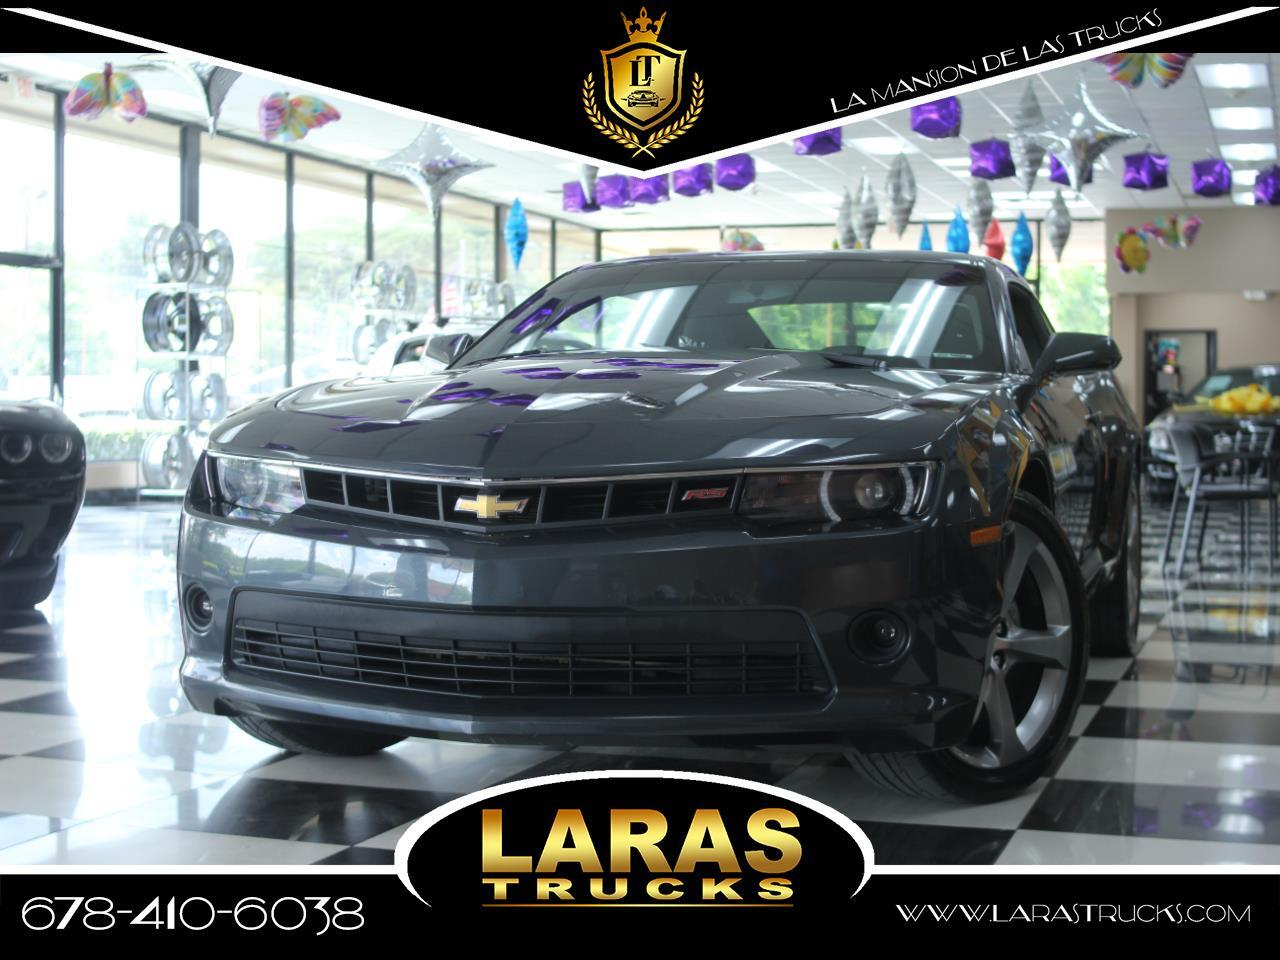 2014 Chevrolet Camaro 2dr Cpe LT w/1LT